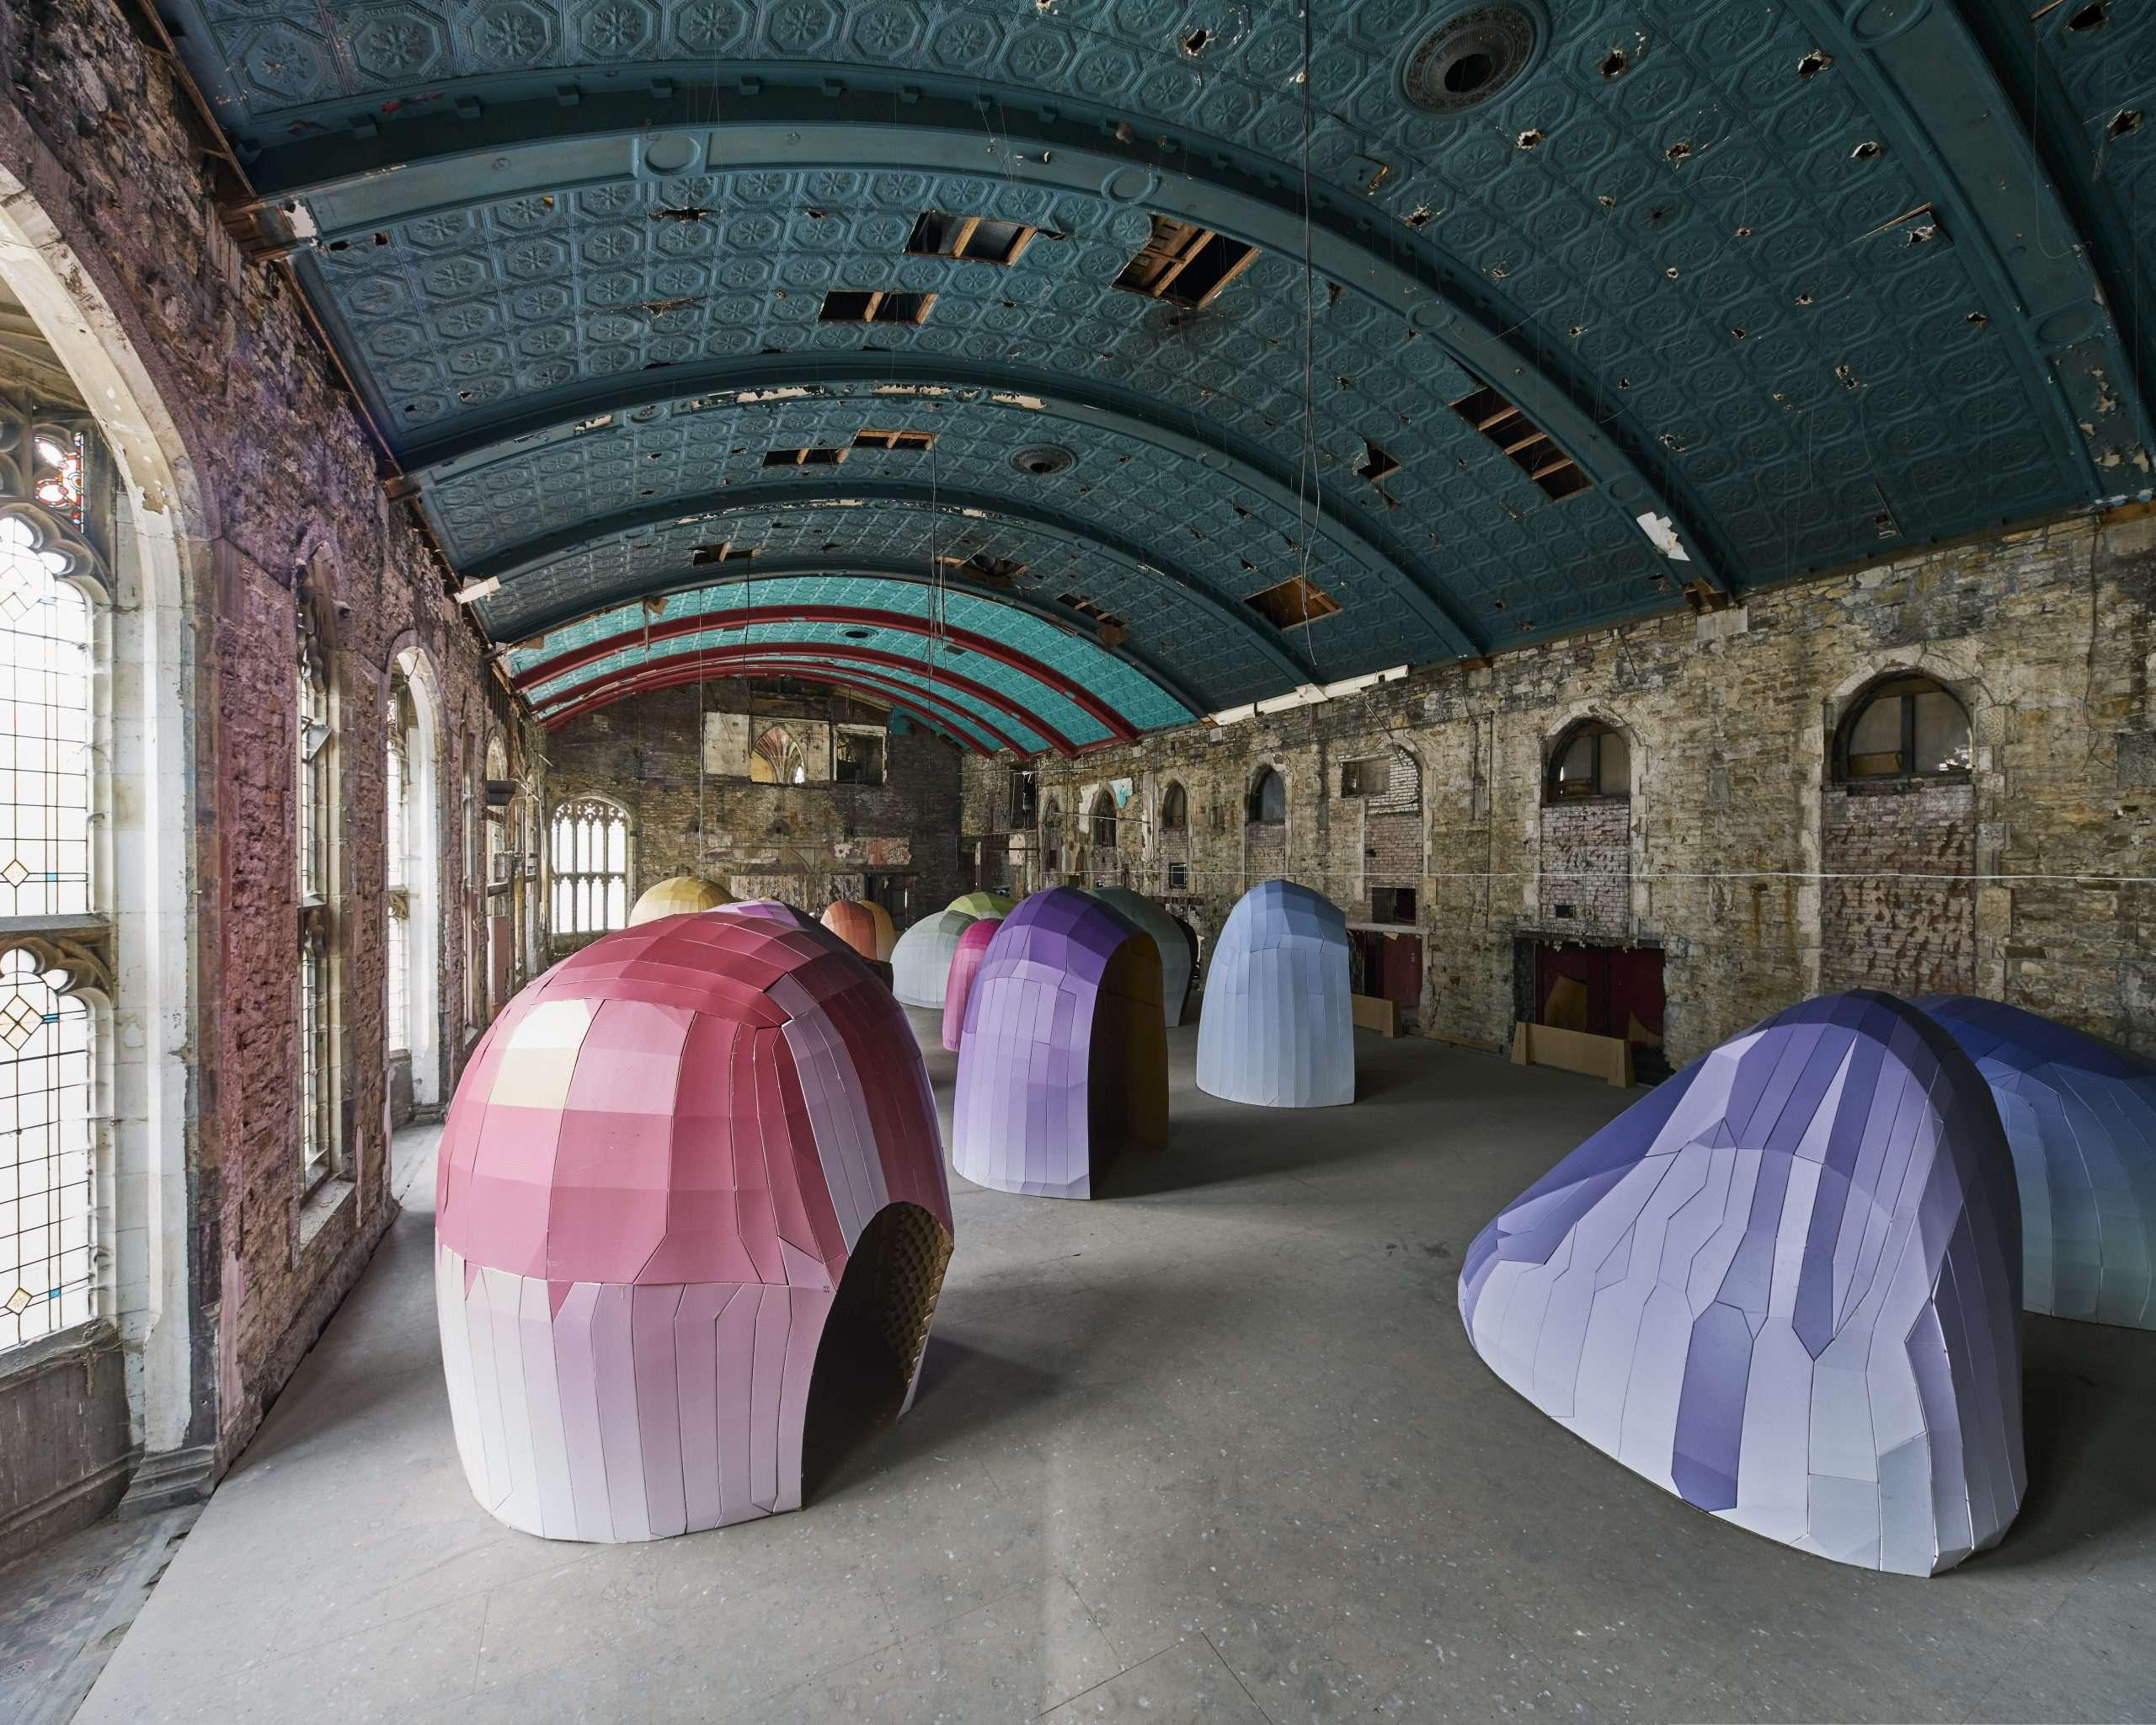 Public art installation using cardboard coloured pods by design studio Lazerian